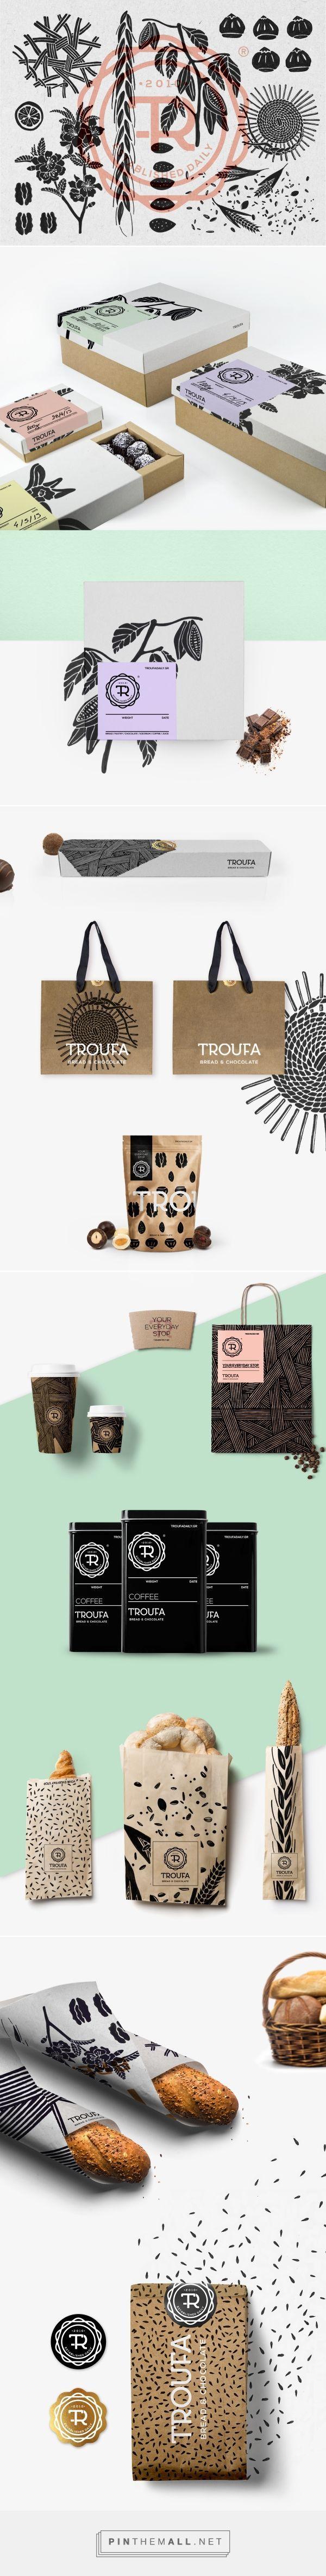 Troufa Branding on Behance   Fivestar Branding – Design and Branding Agency & Inspiration Gallery